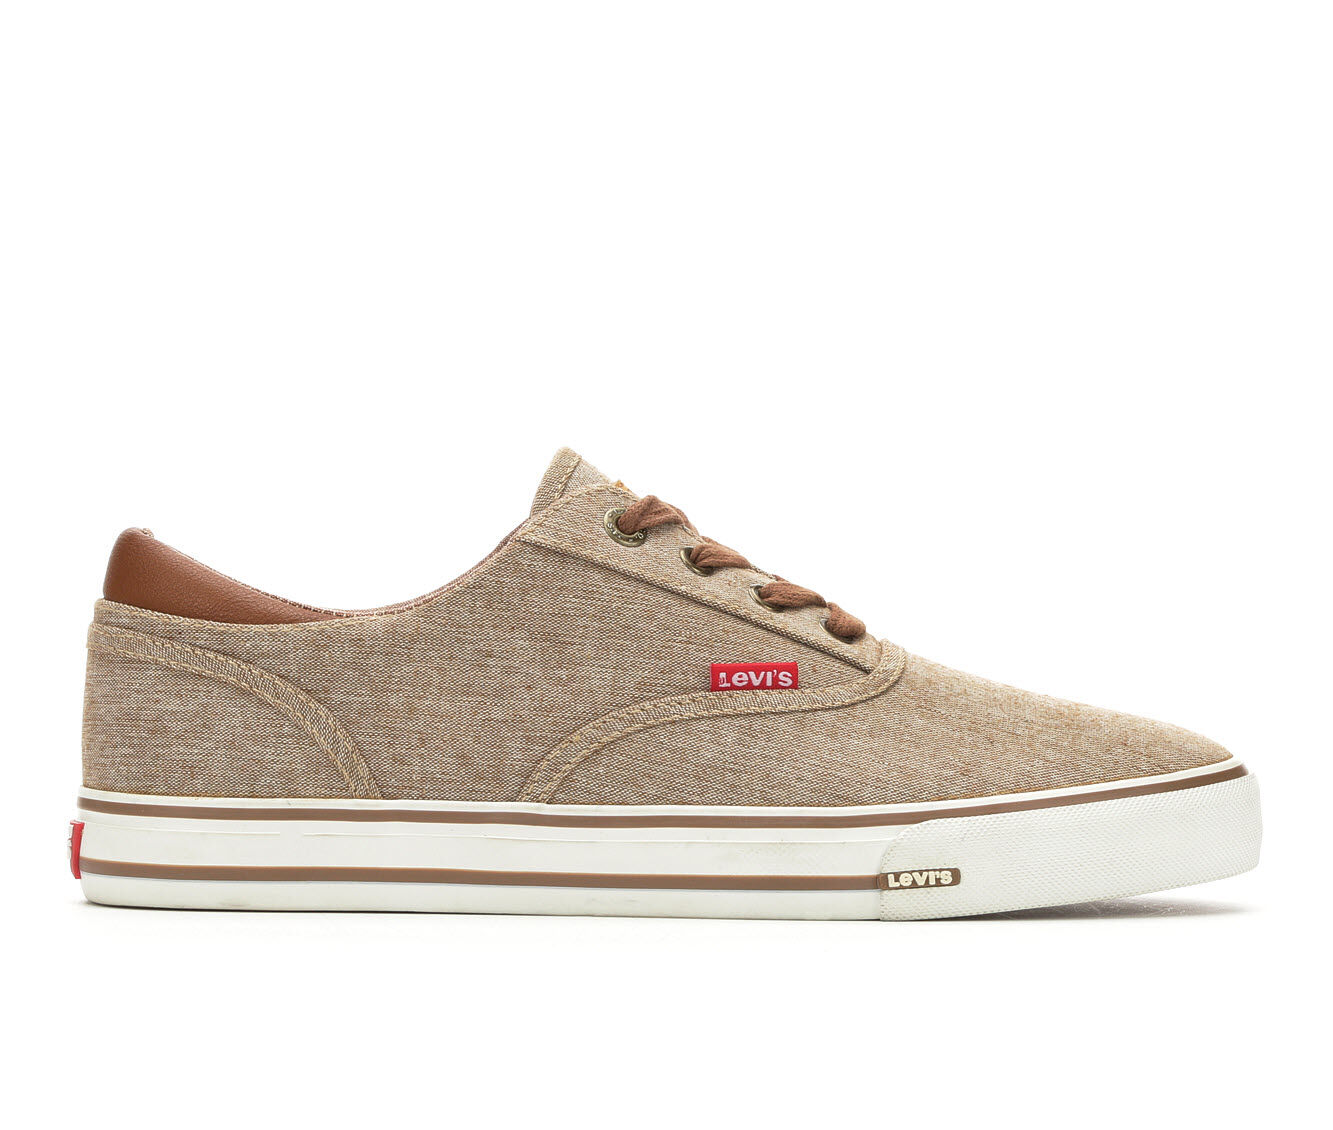 Men's Levis Ethan Slub ll Casual Shoes